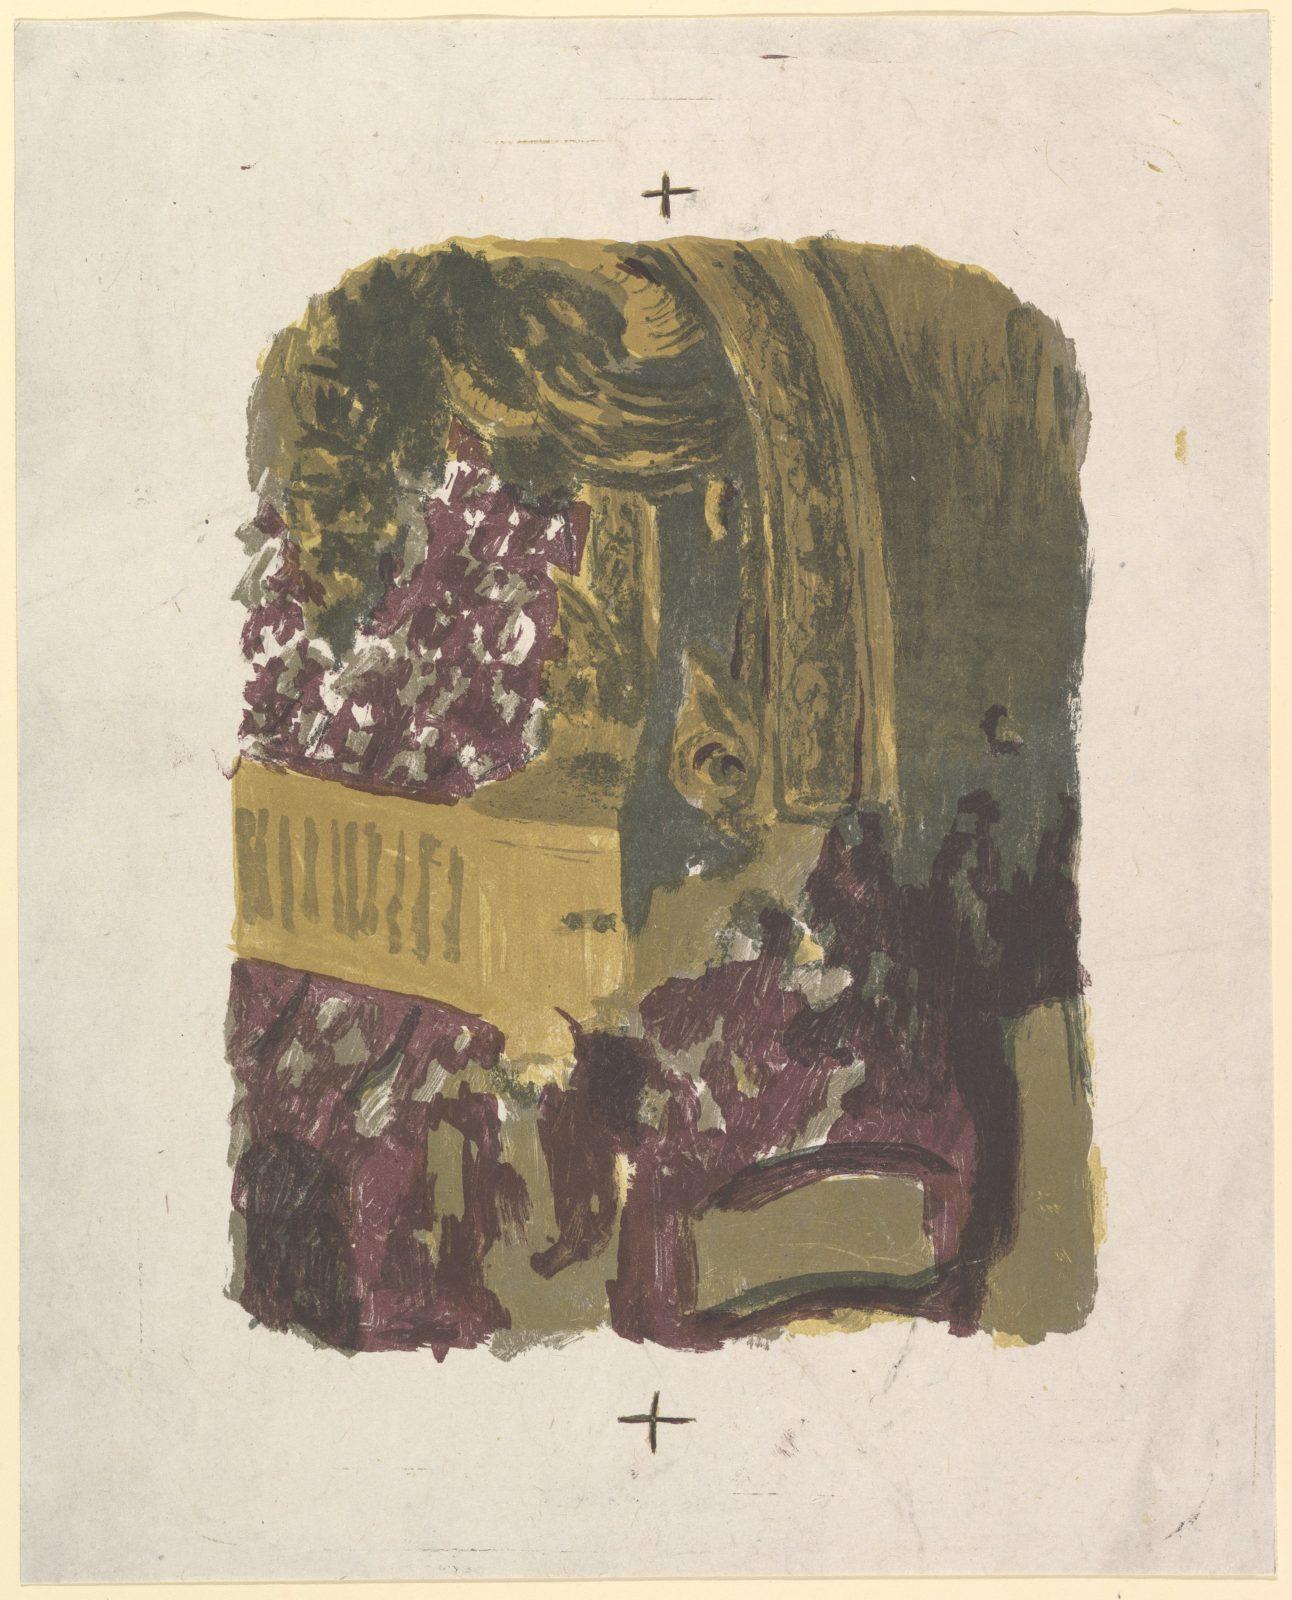 A Gallery at the Gymnasium (Un galerie au gymnase)